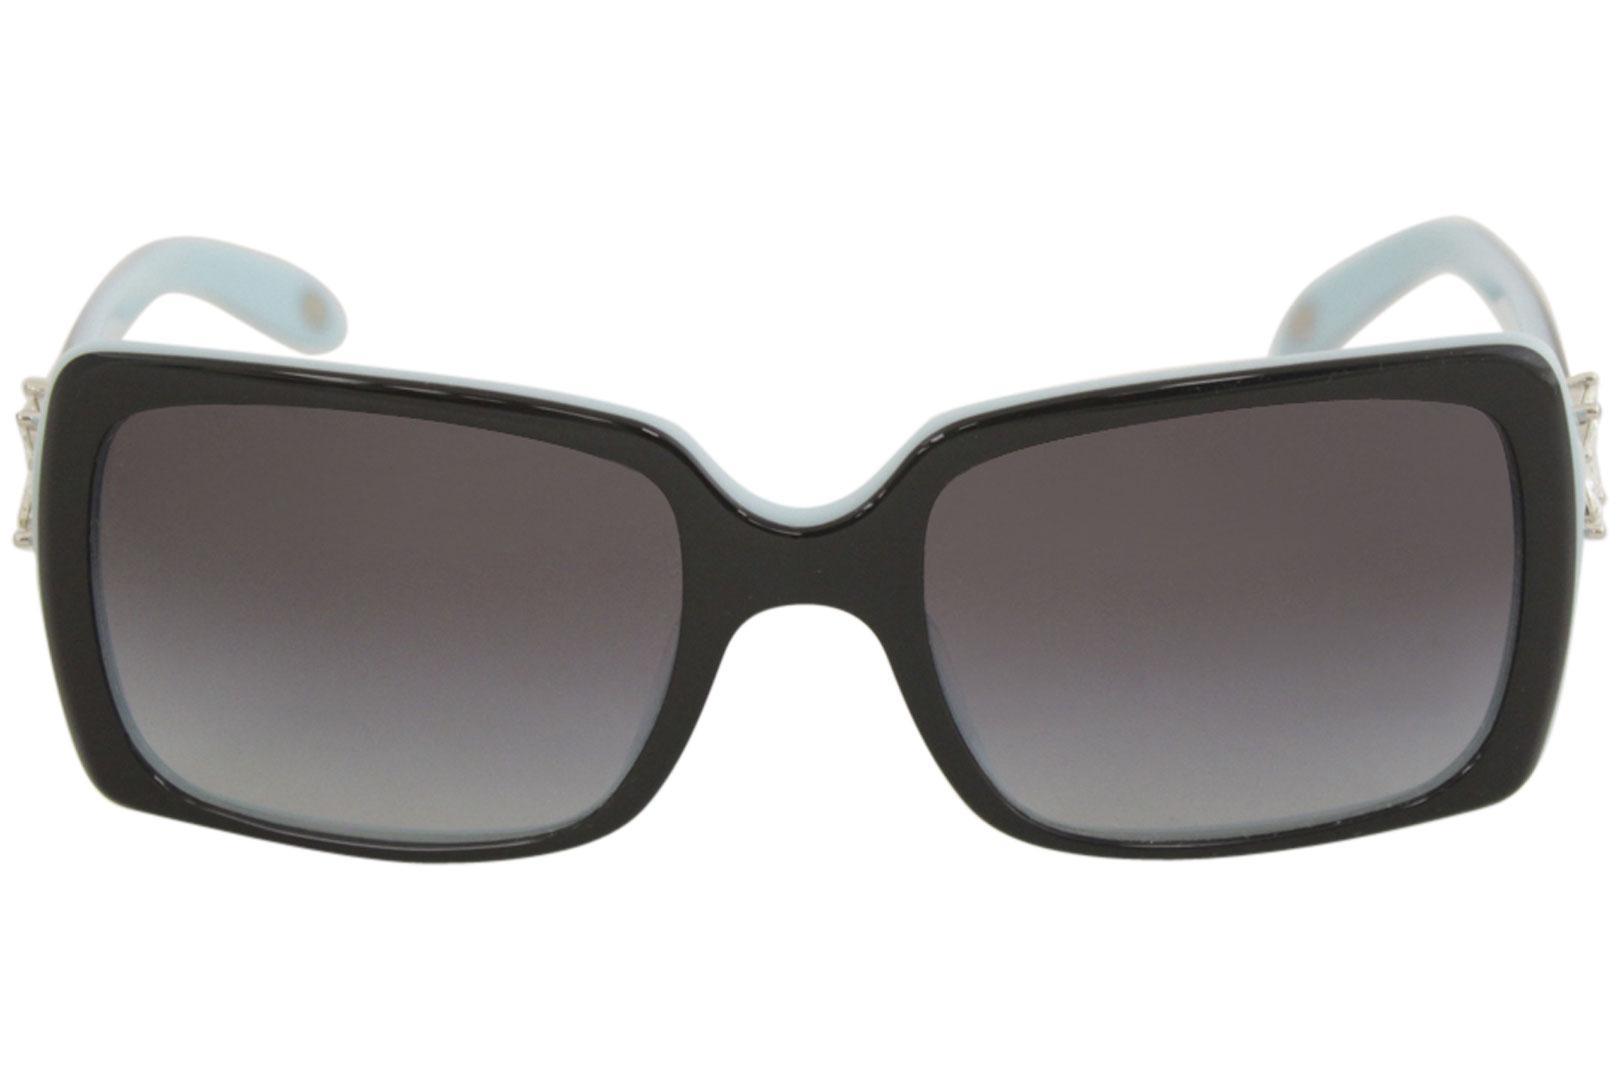 b80678505a096 Women s TF4047B TF 4047 B Fashion Square Sunglasses by Tiffany   Co. 12345